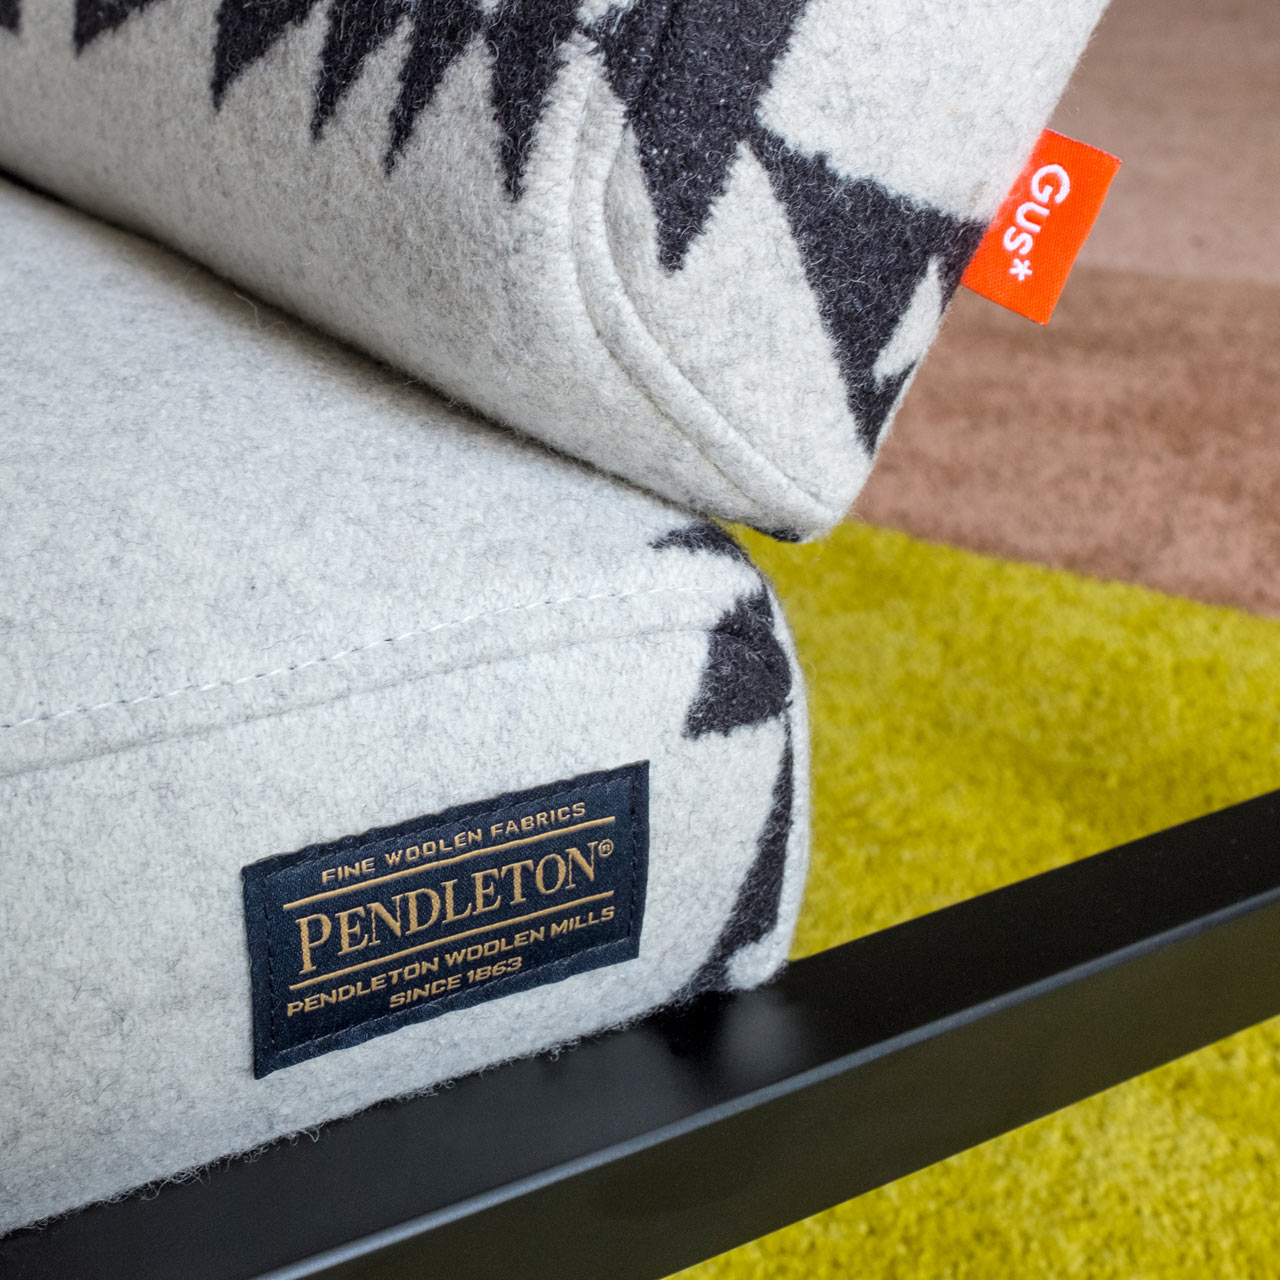 Gus-Modern-X-Pendleton-Collection-17-Halifax-Chair.jpg